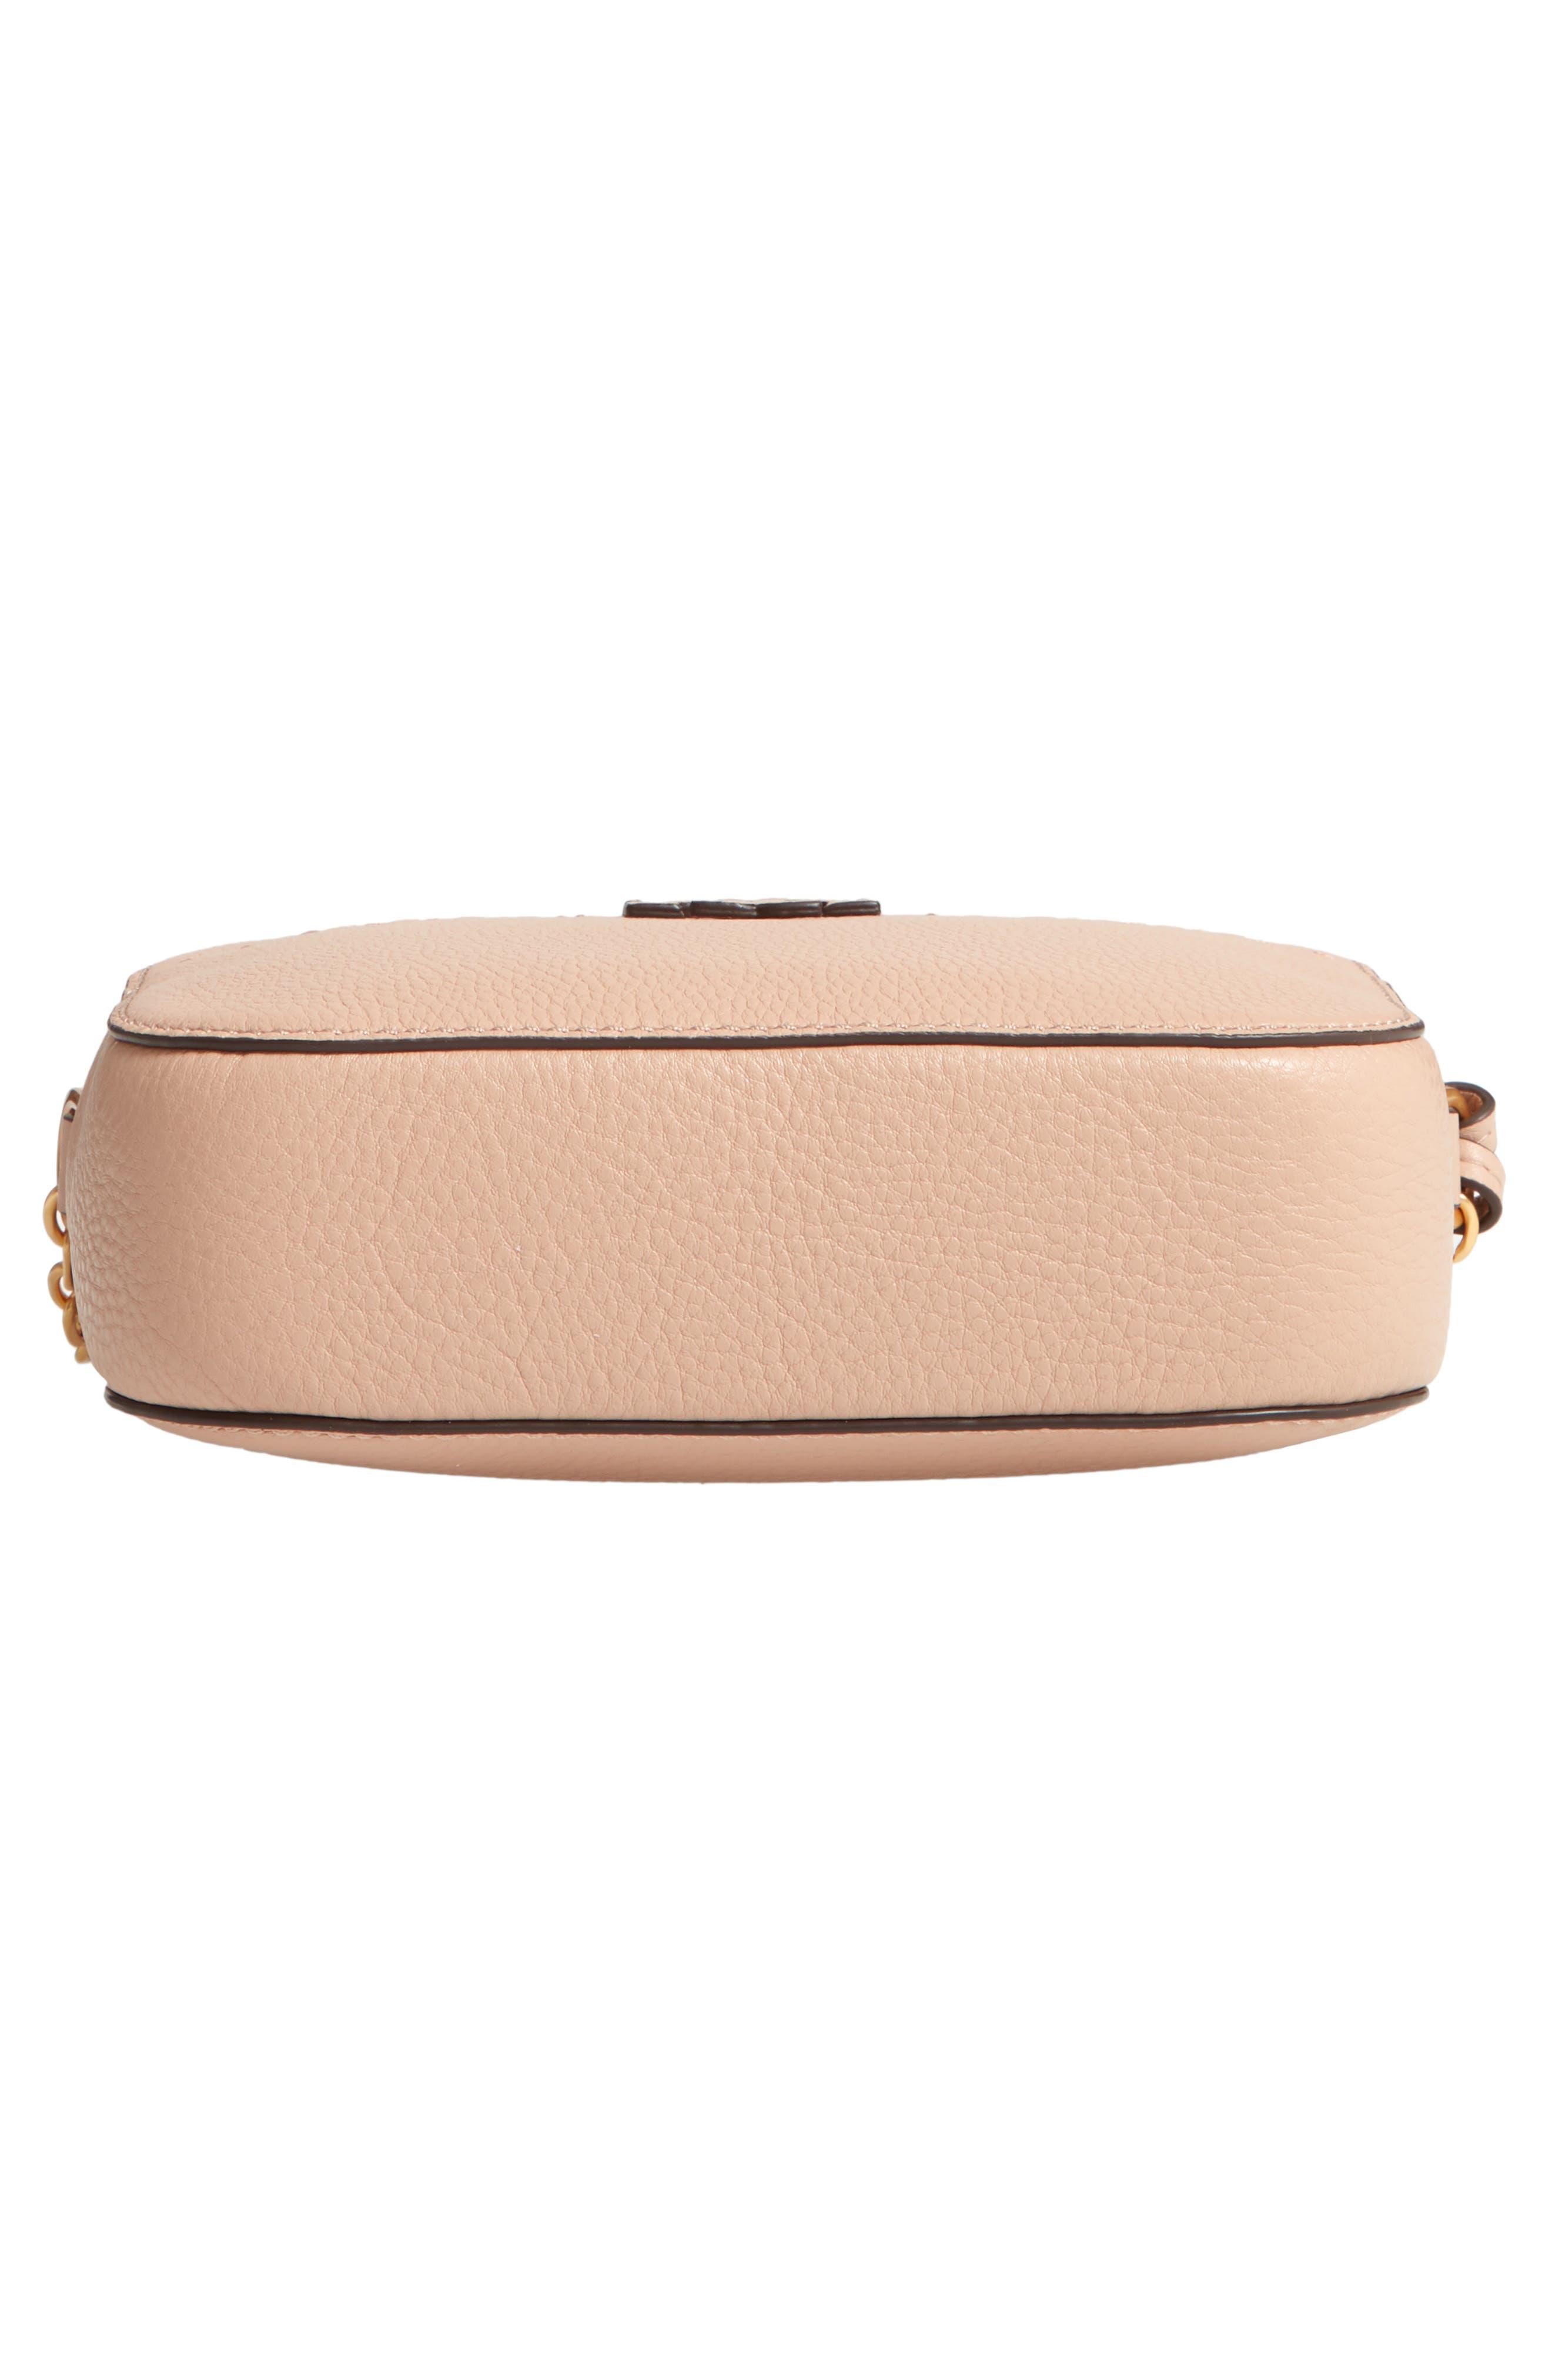 McGraw Leather Camera Bag,                             Alternate thumbnail 6, color,                             DEVON SAND